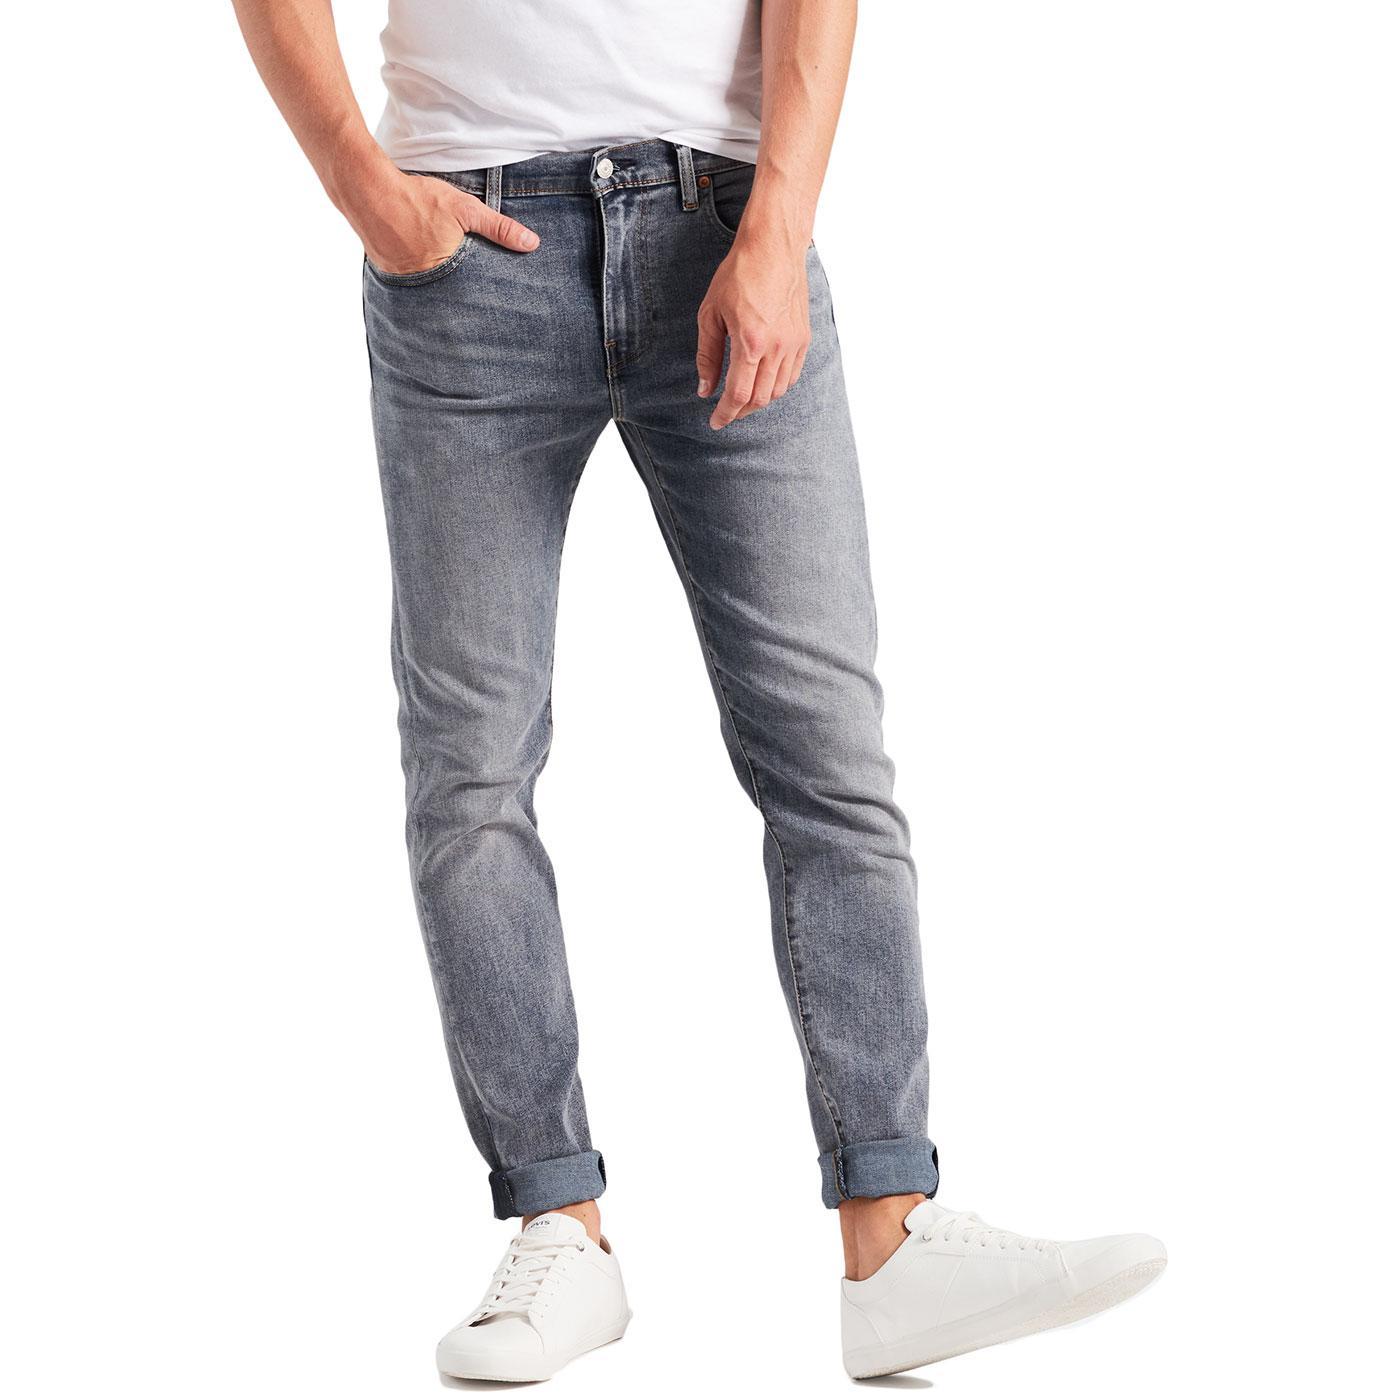 LEVI'S 512 Slim Taper Denim Jeans - DESPACITO ADV